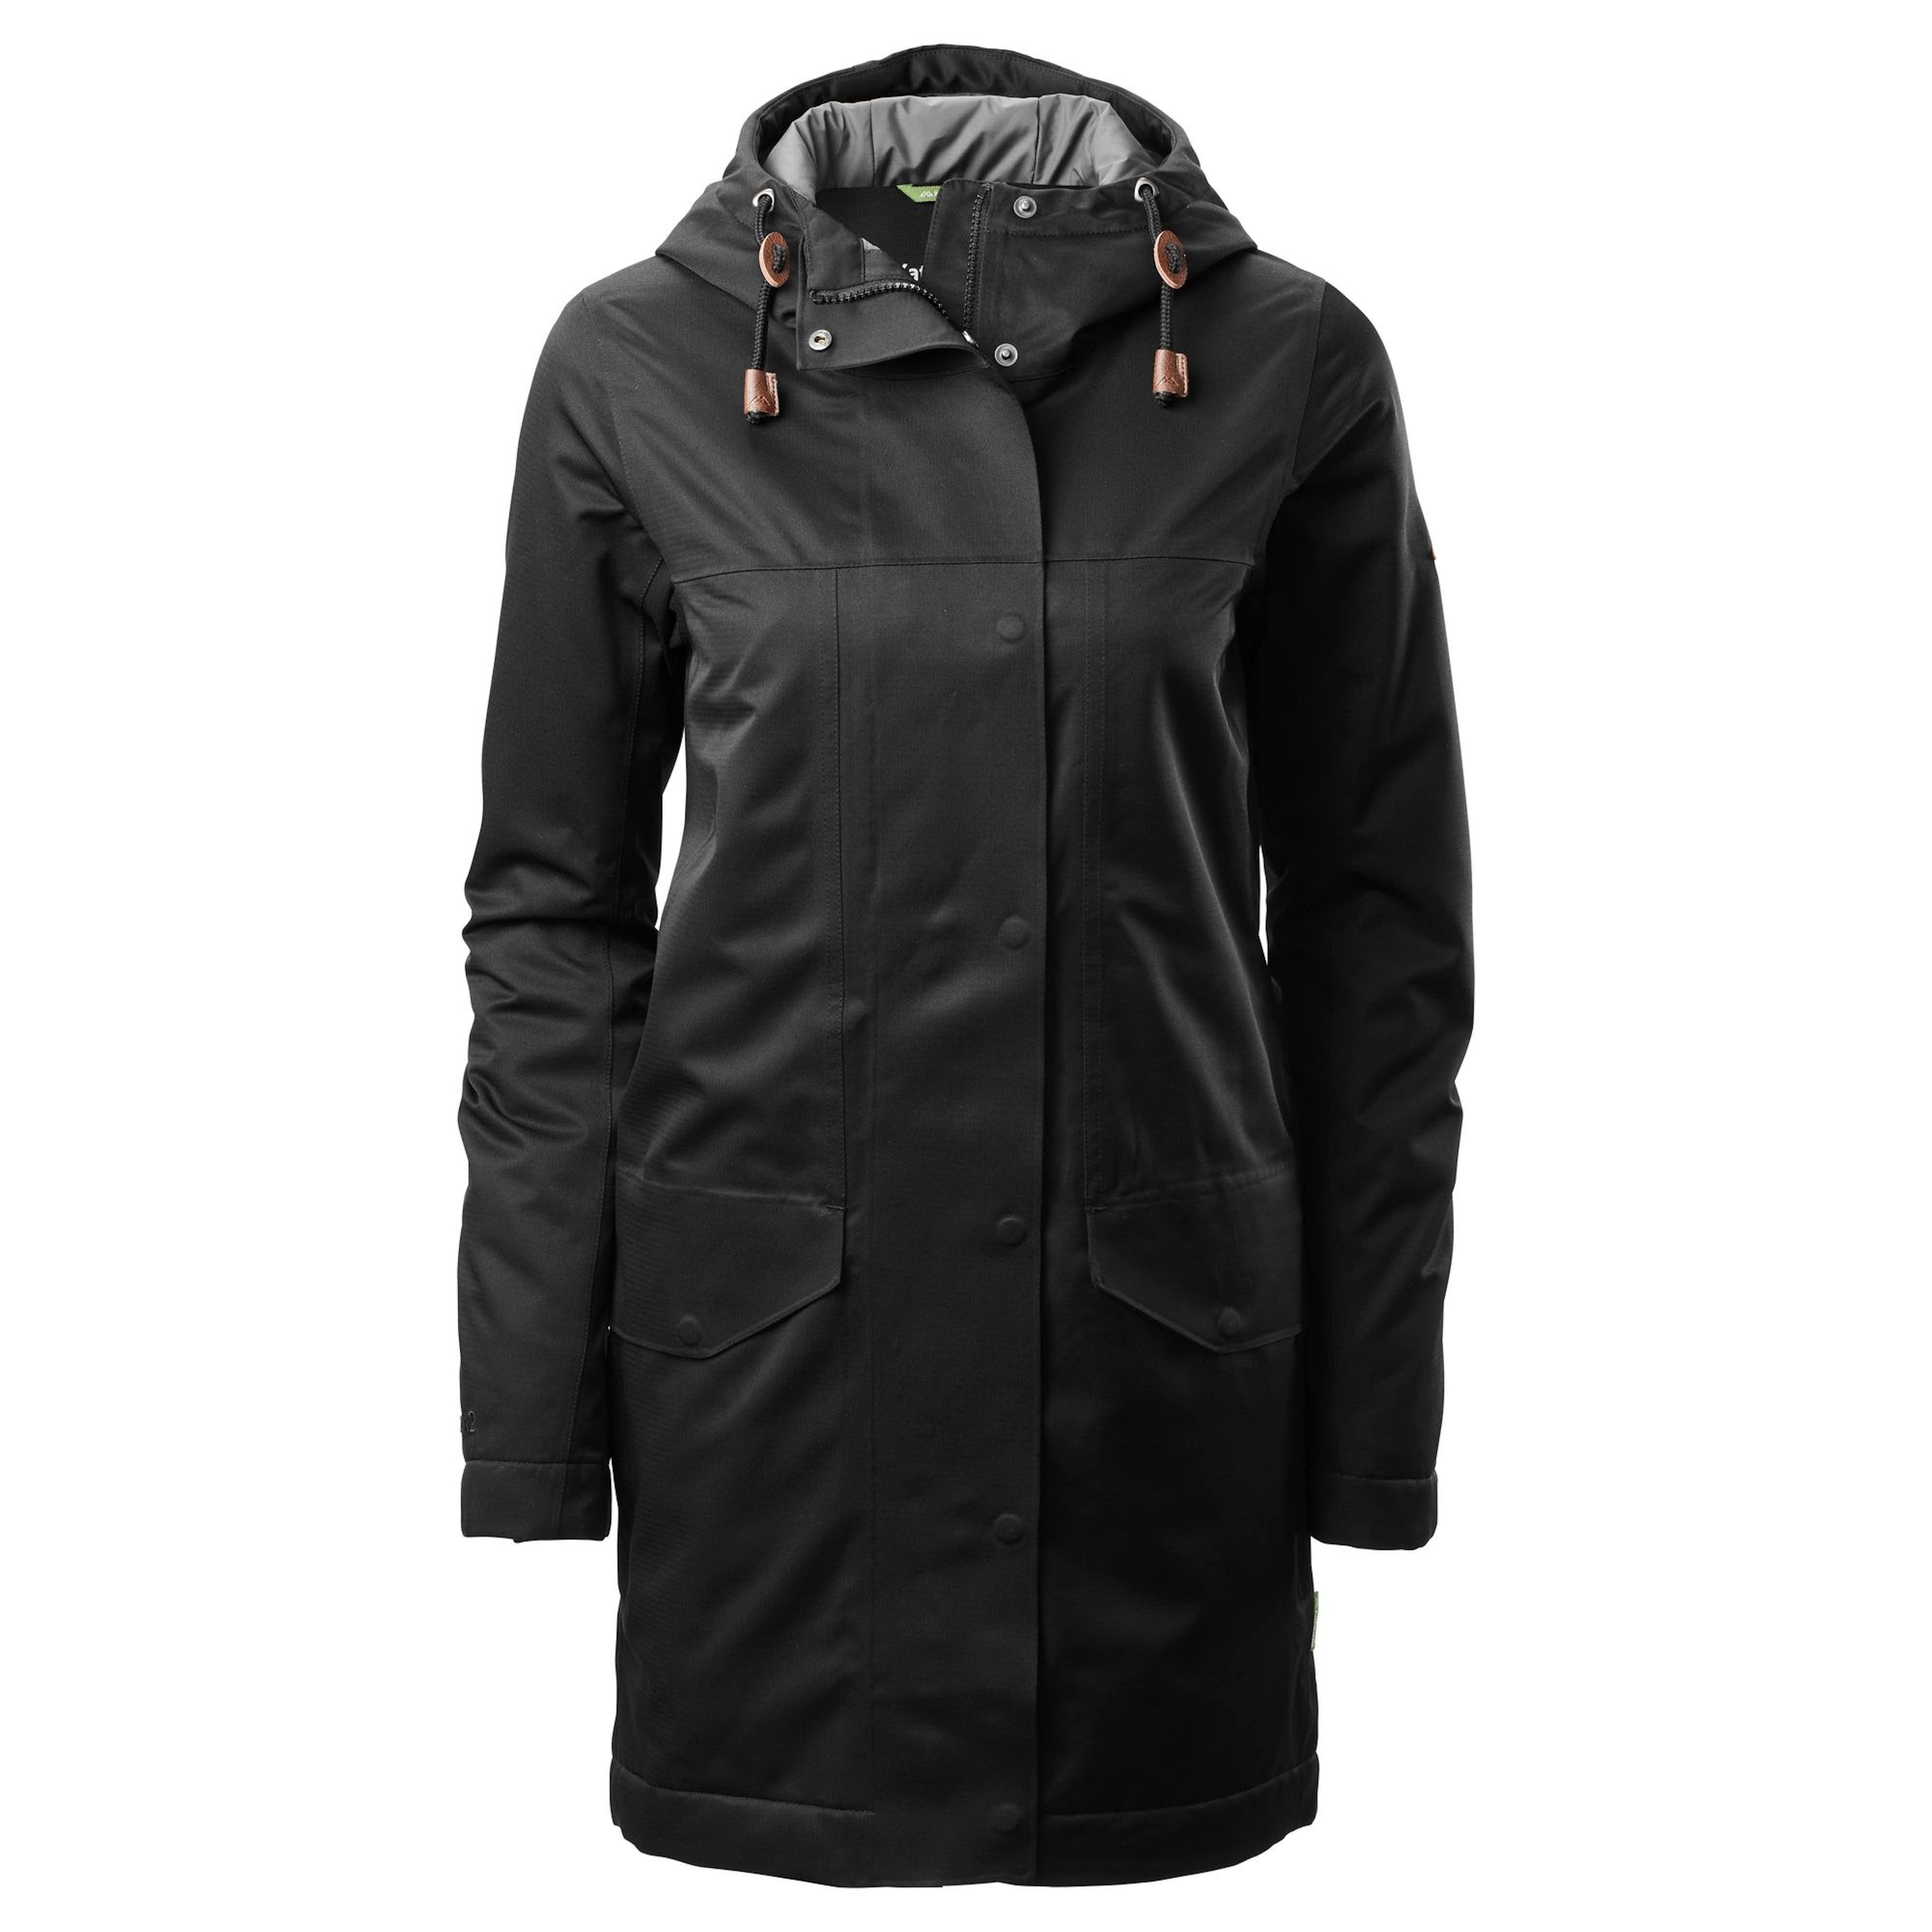 best price super quality uk cheap sale Women's Rain Jackets & Raincoats | Waterproof & Lightweight | US